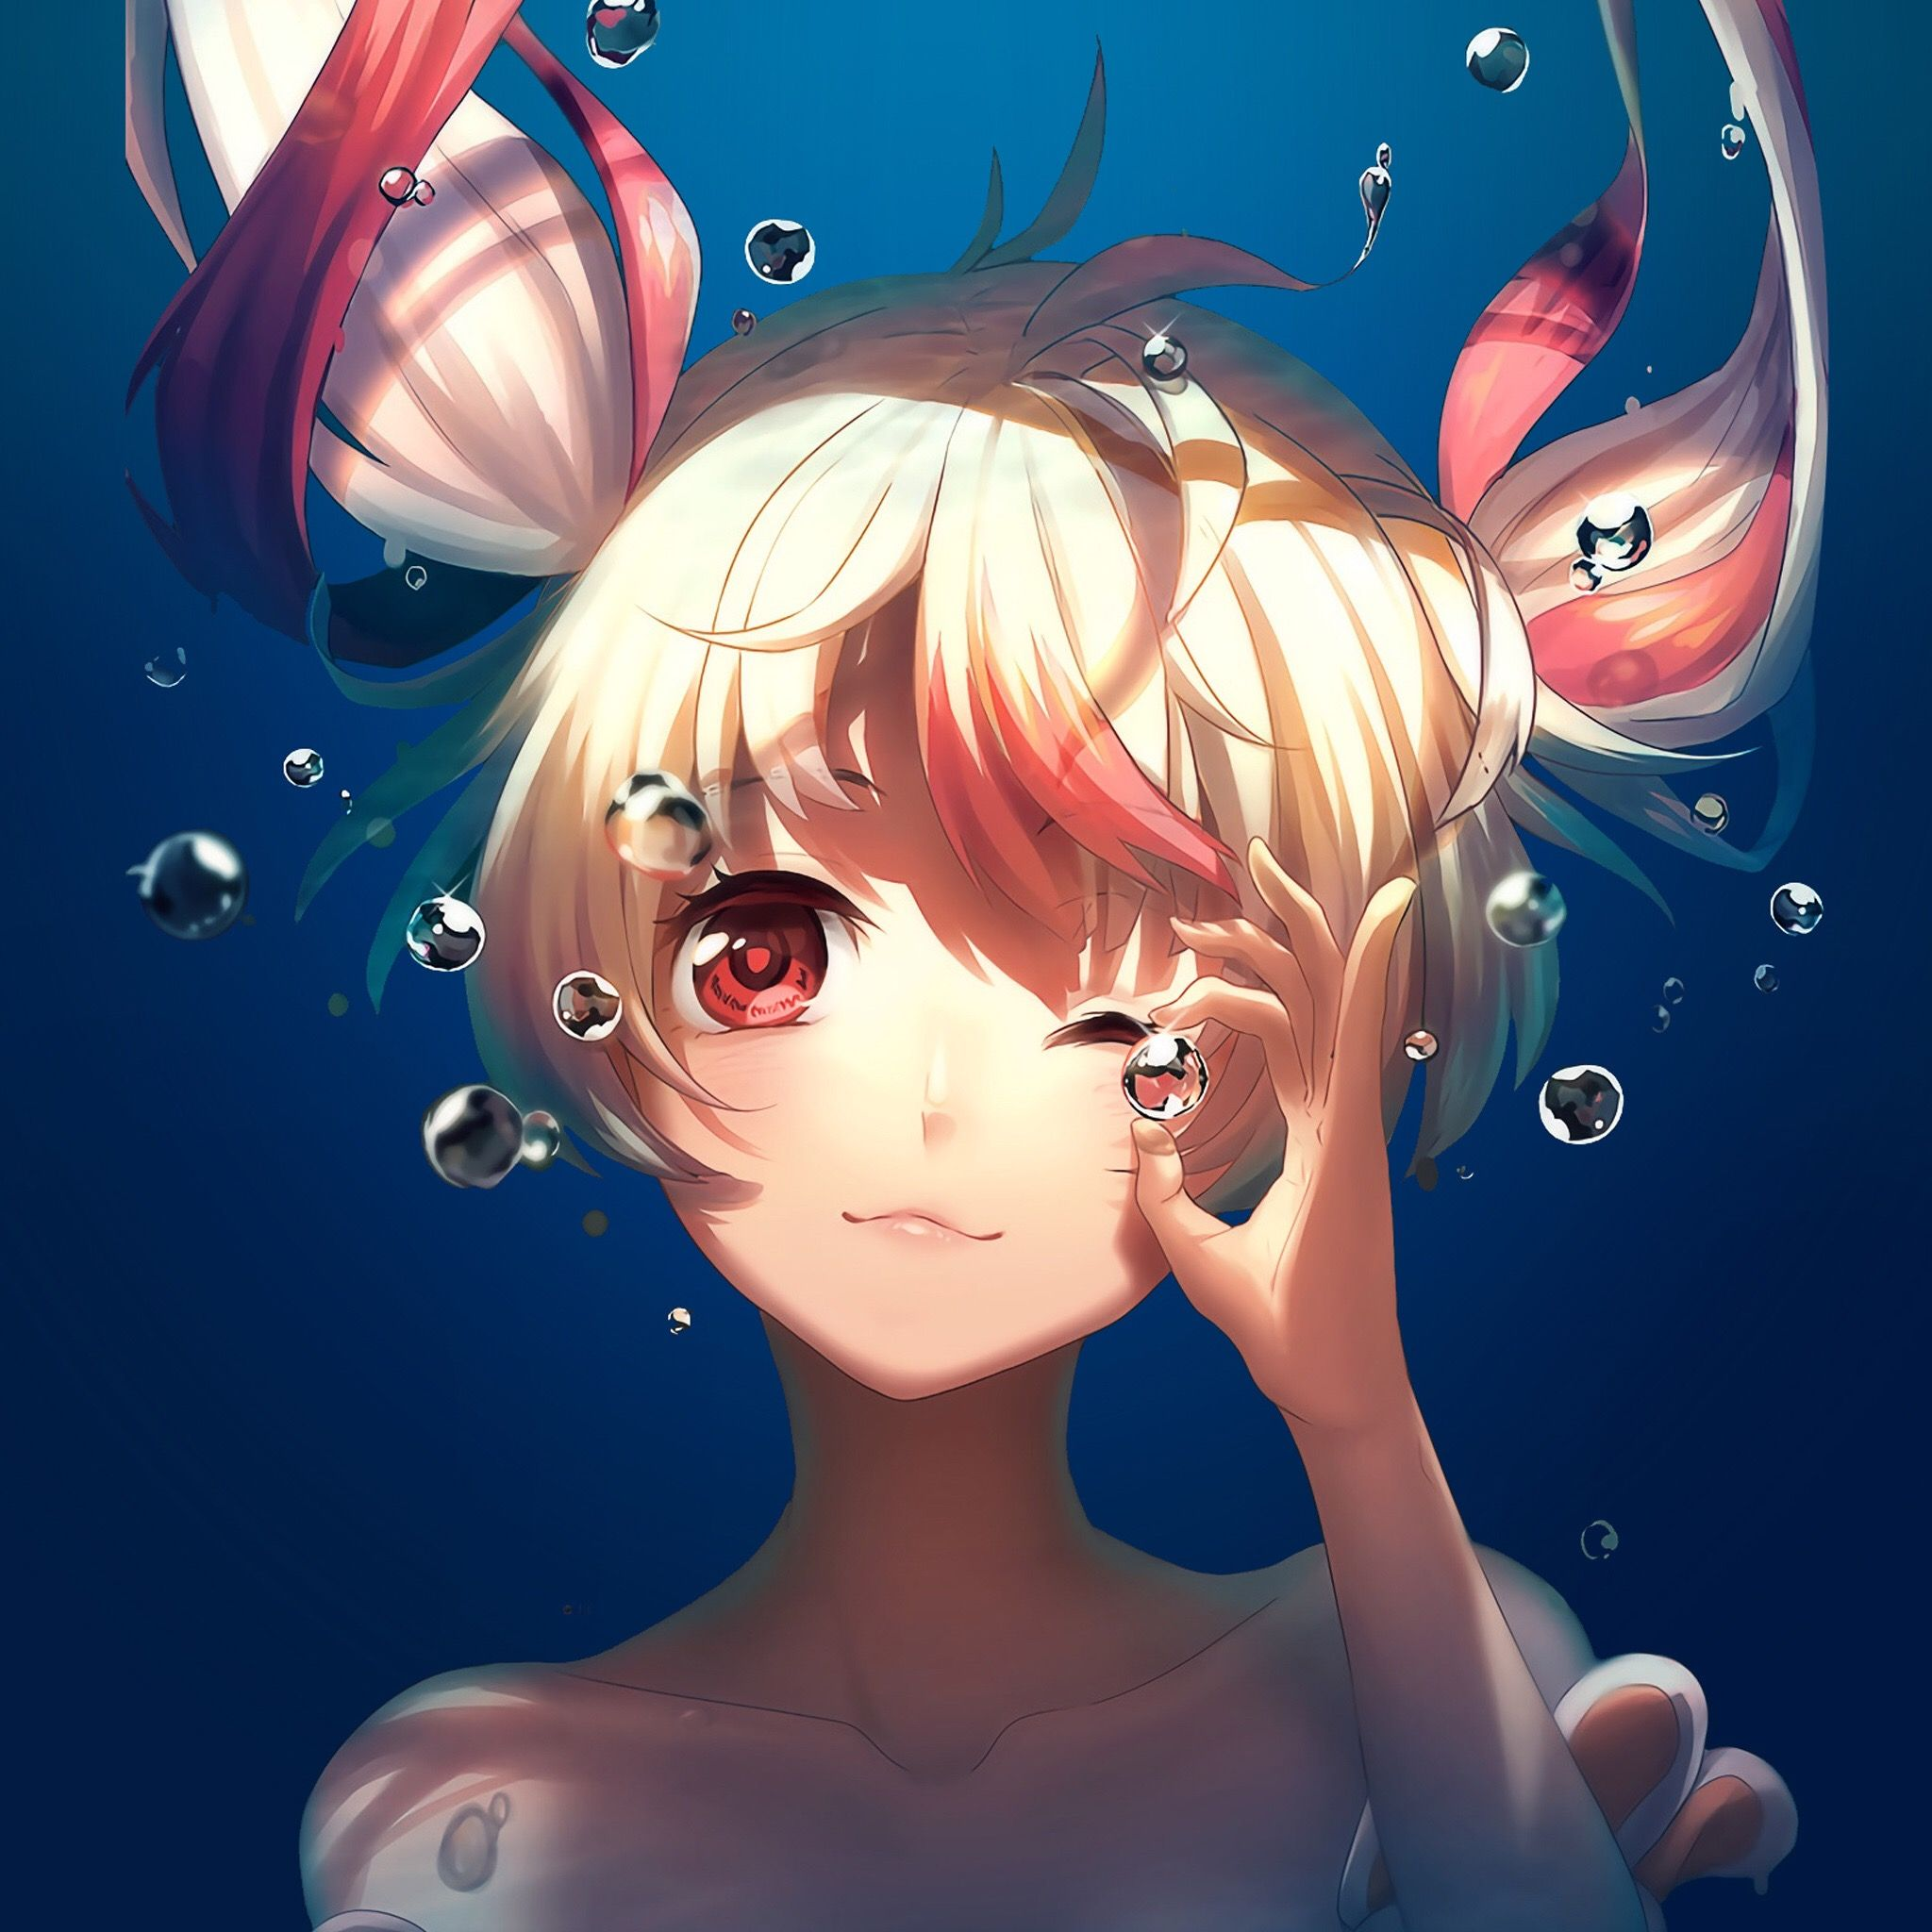 Pin on JP Cute Girls [anime]